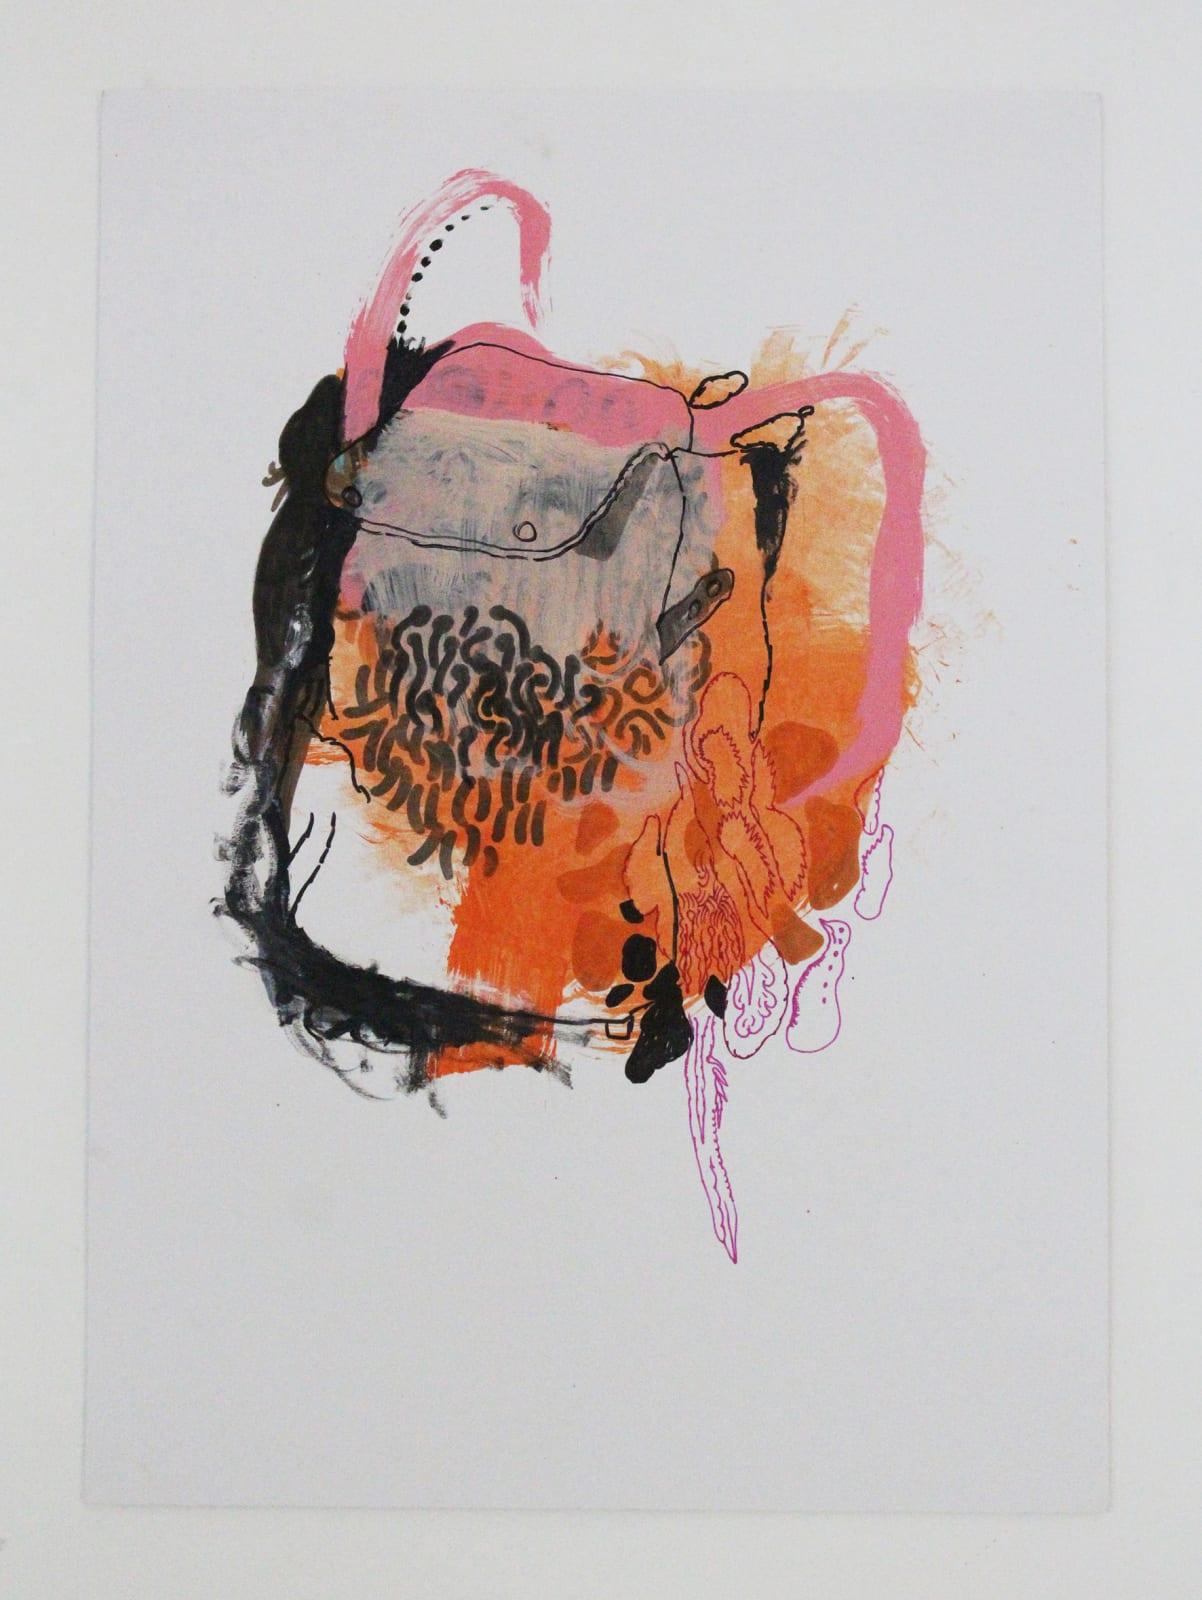 Jagath Weerasinghe, Untitled XIV, 2019